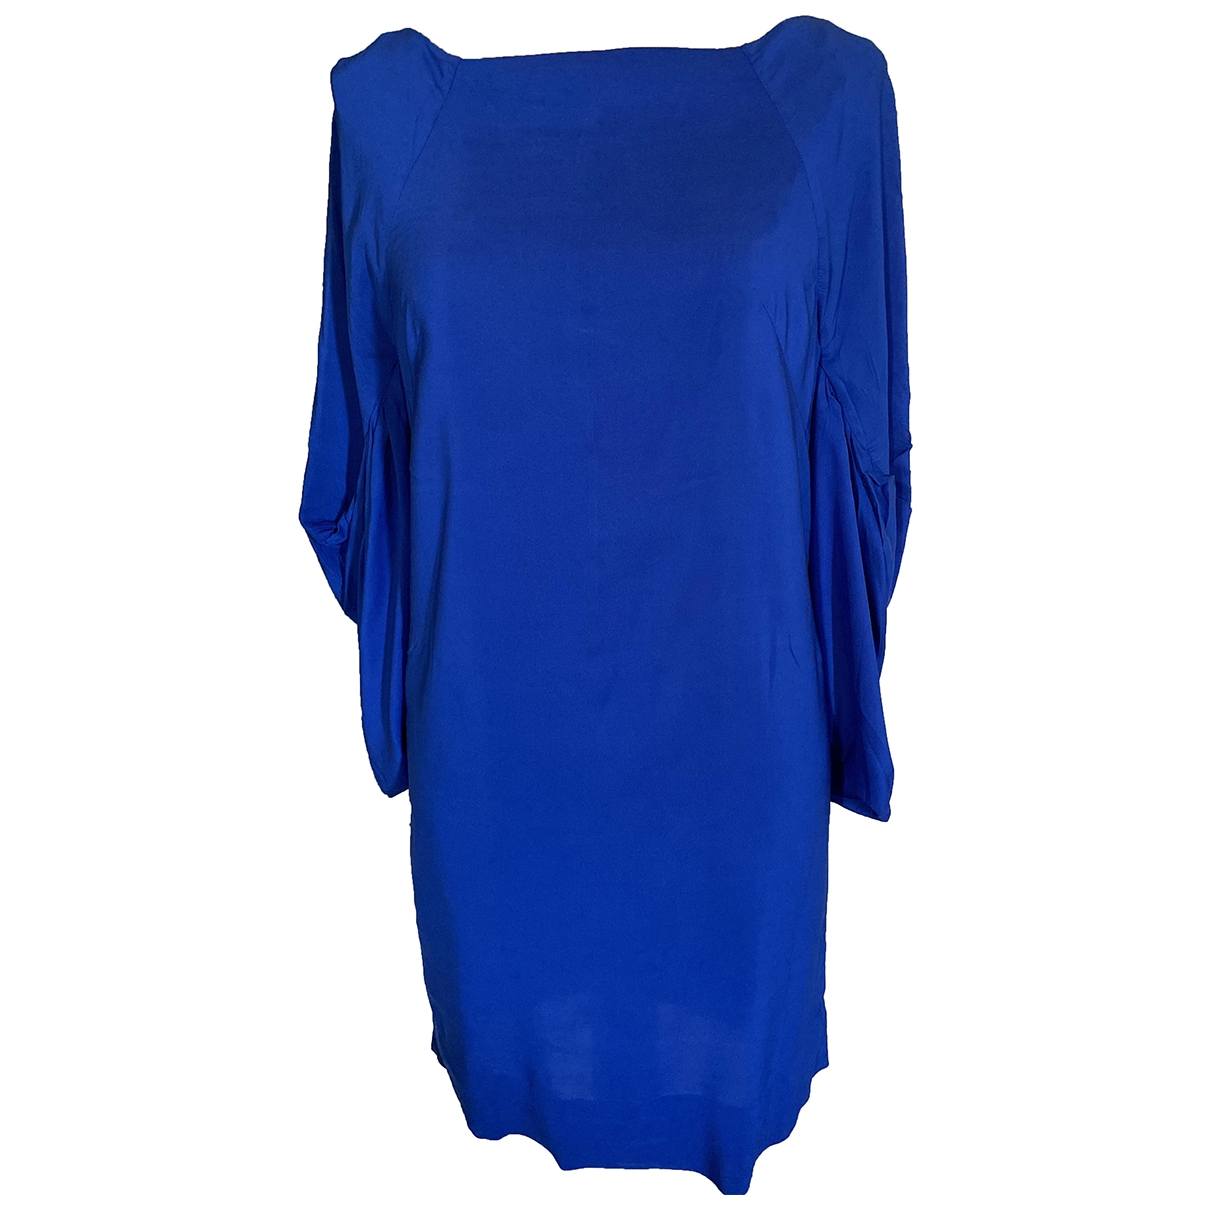 Cos - Robe   pour femme - bleu